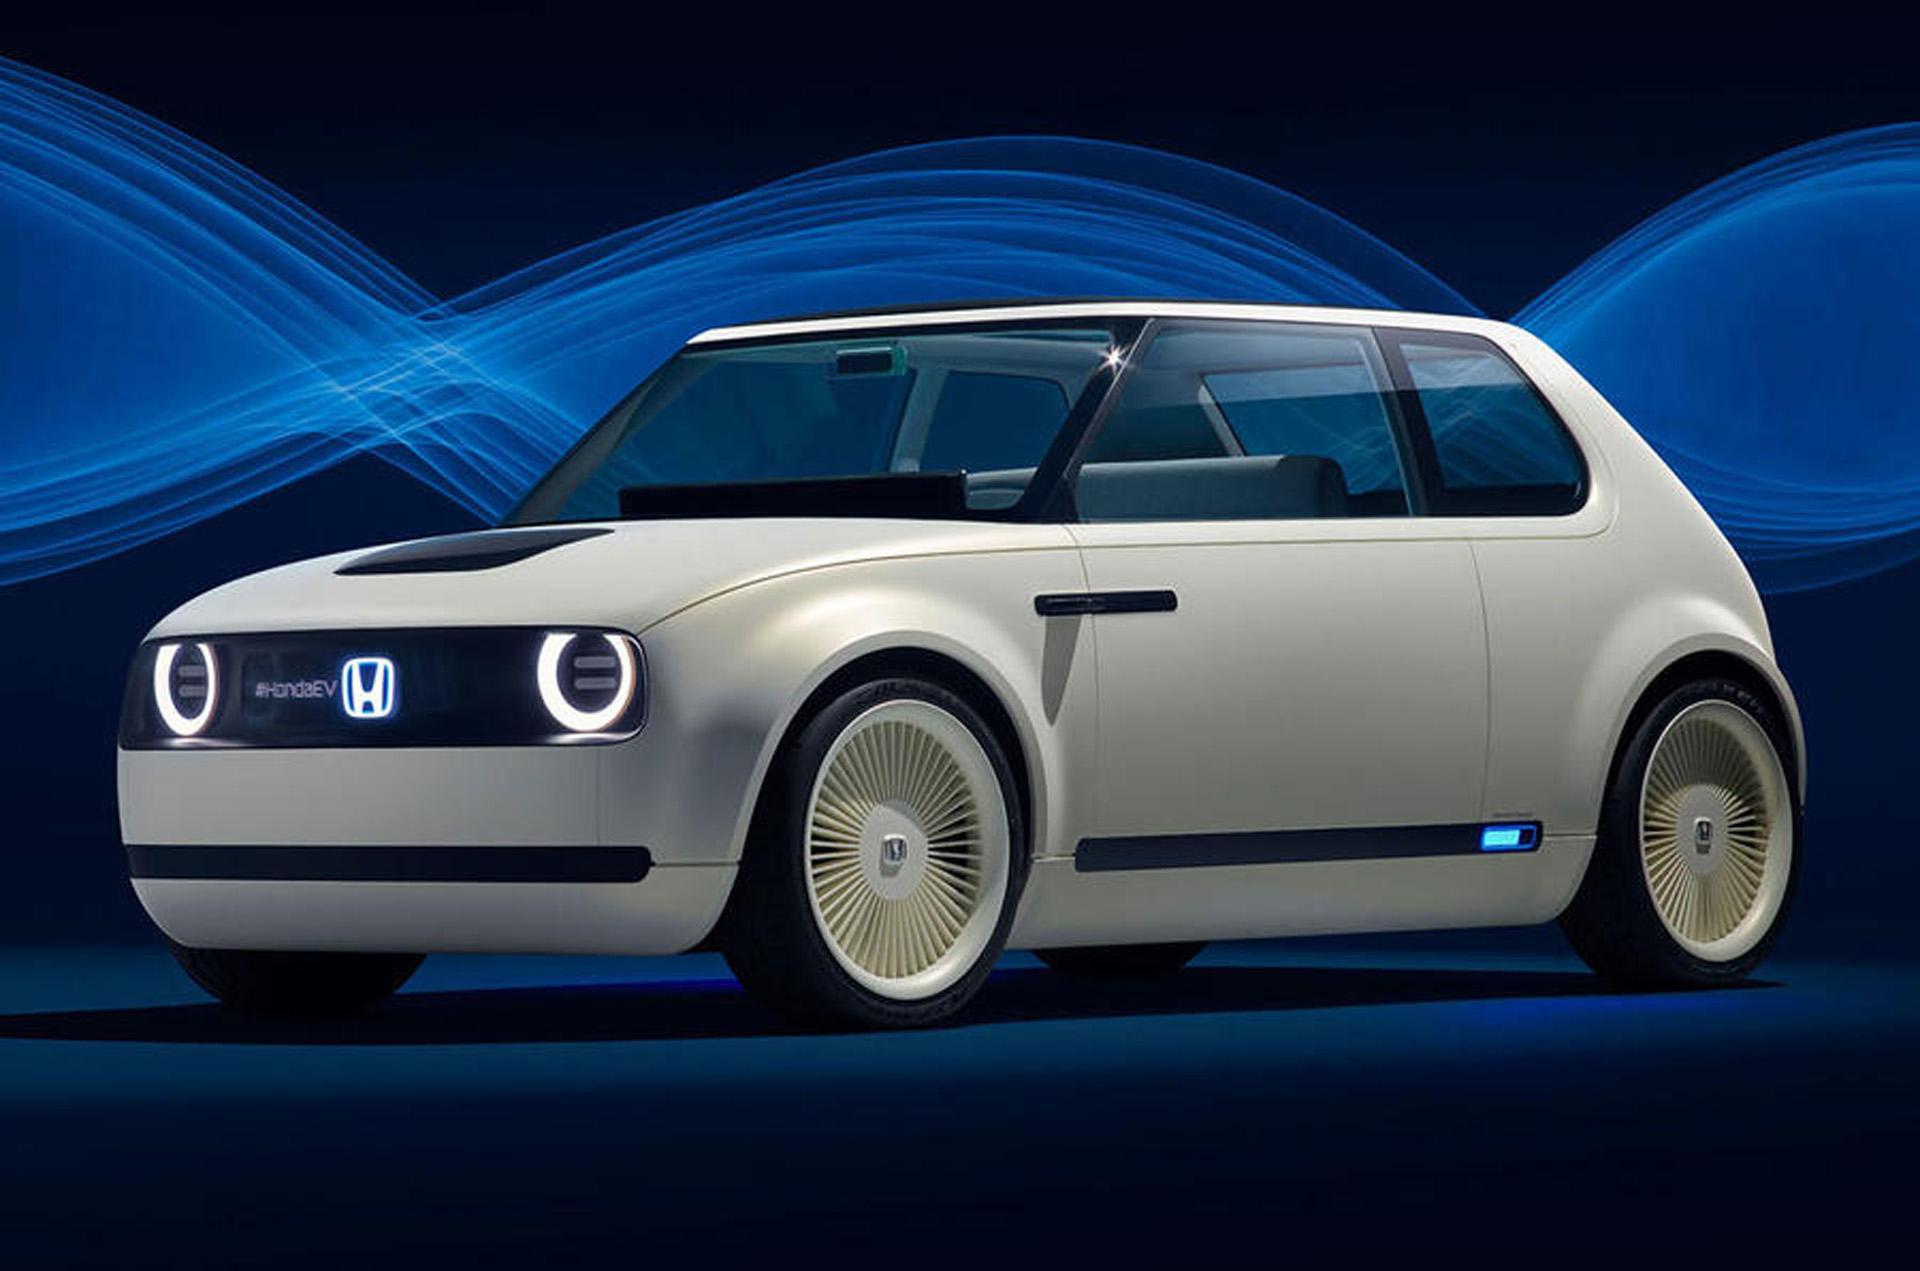 Honda North America >> Honda Urban Ev Concept To Go On Sale In 2019 But Not For North America